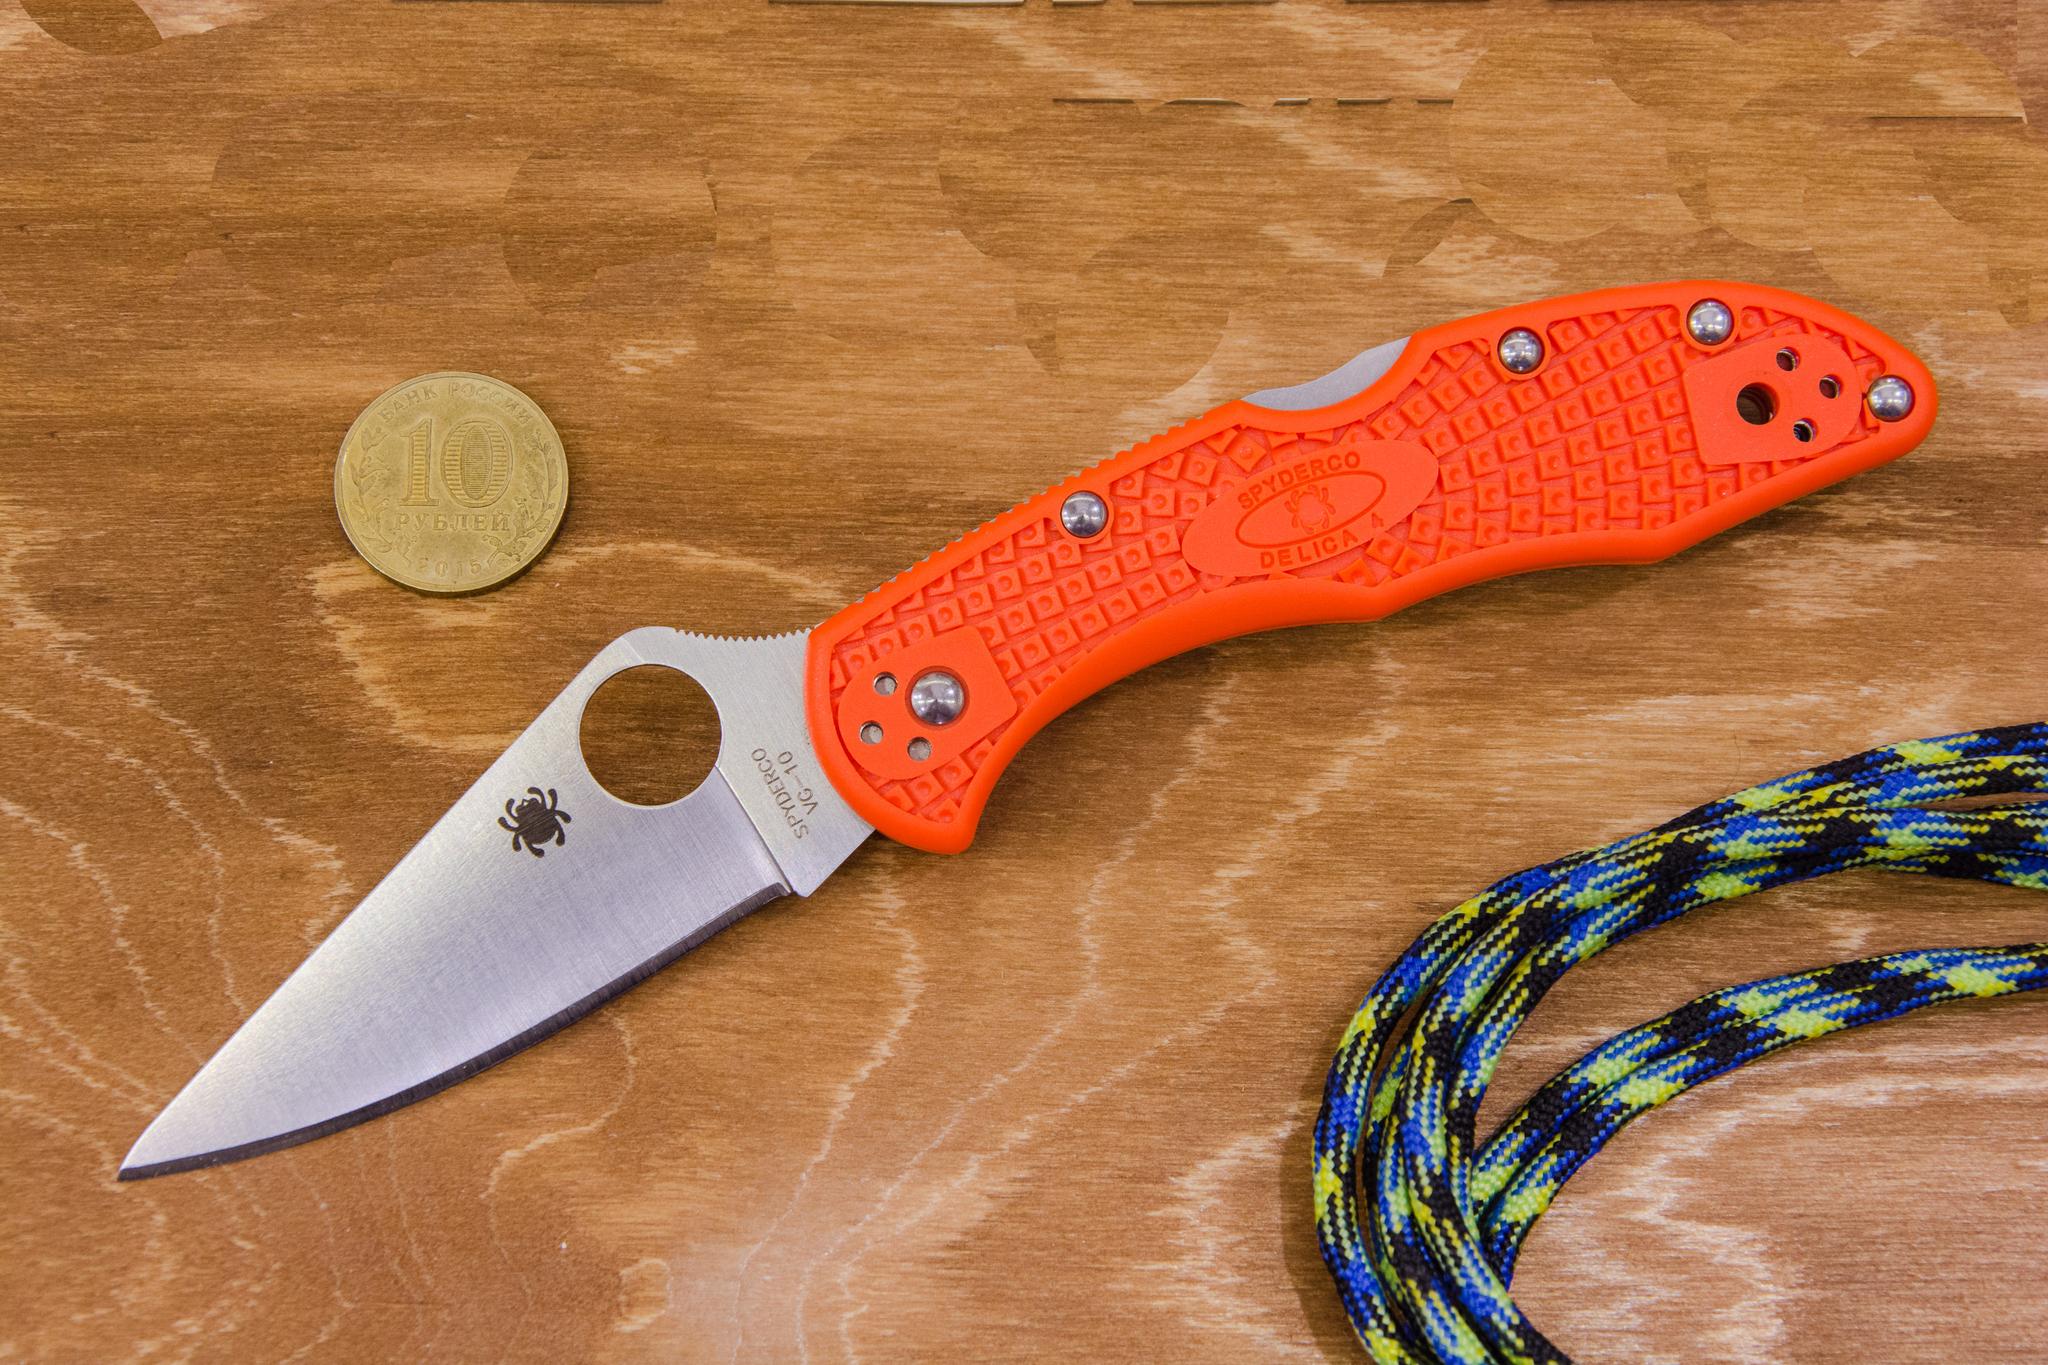 Фото 13 - Складной нож Delica 4 Flat Ground - Spyderco 11FPOR, сталь VG-10 Satin Plain, рукоять термопластик FRN оранжевый